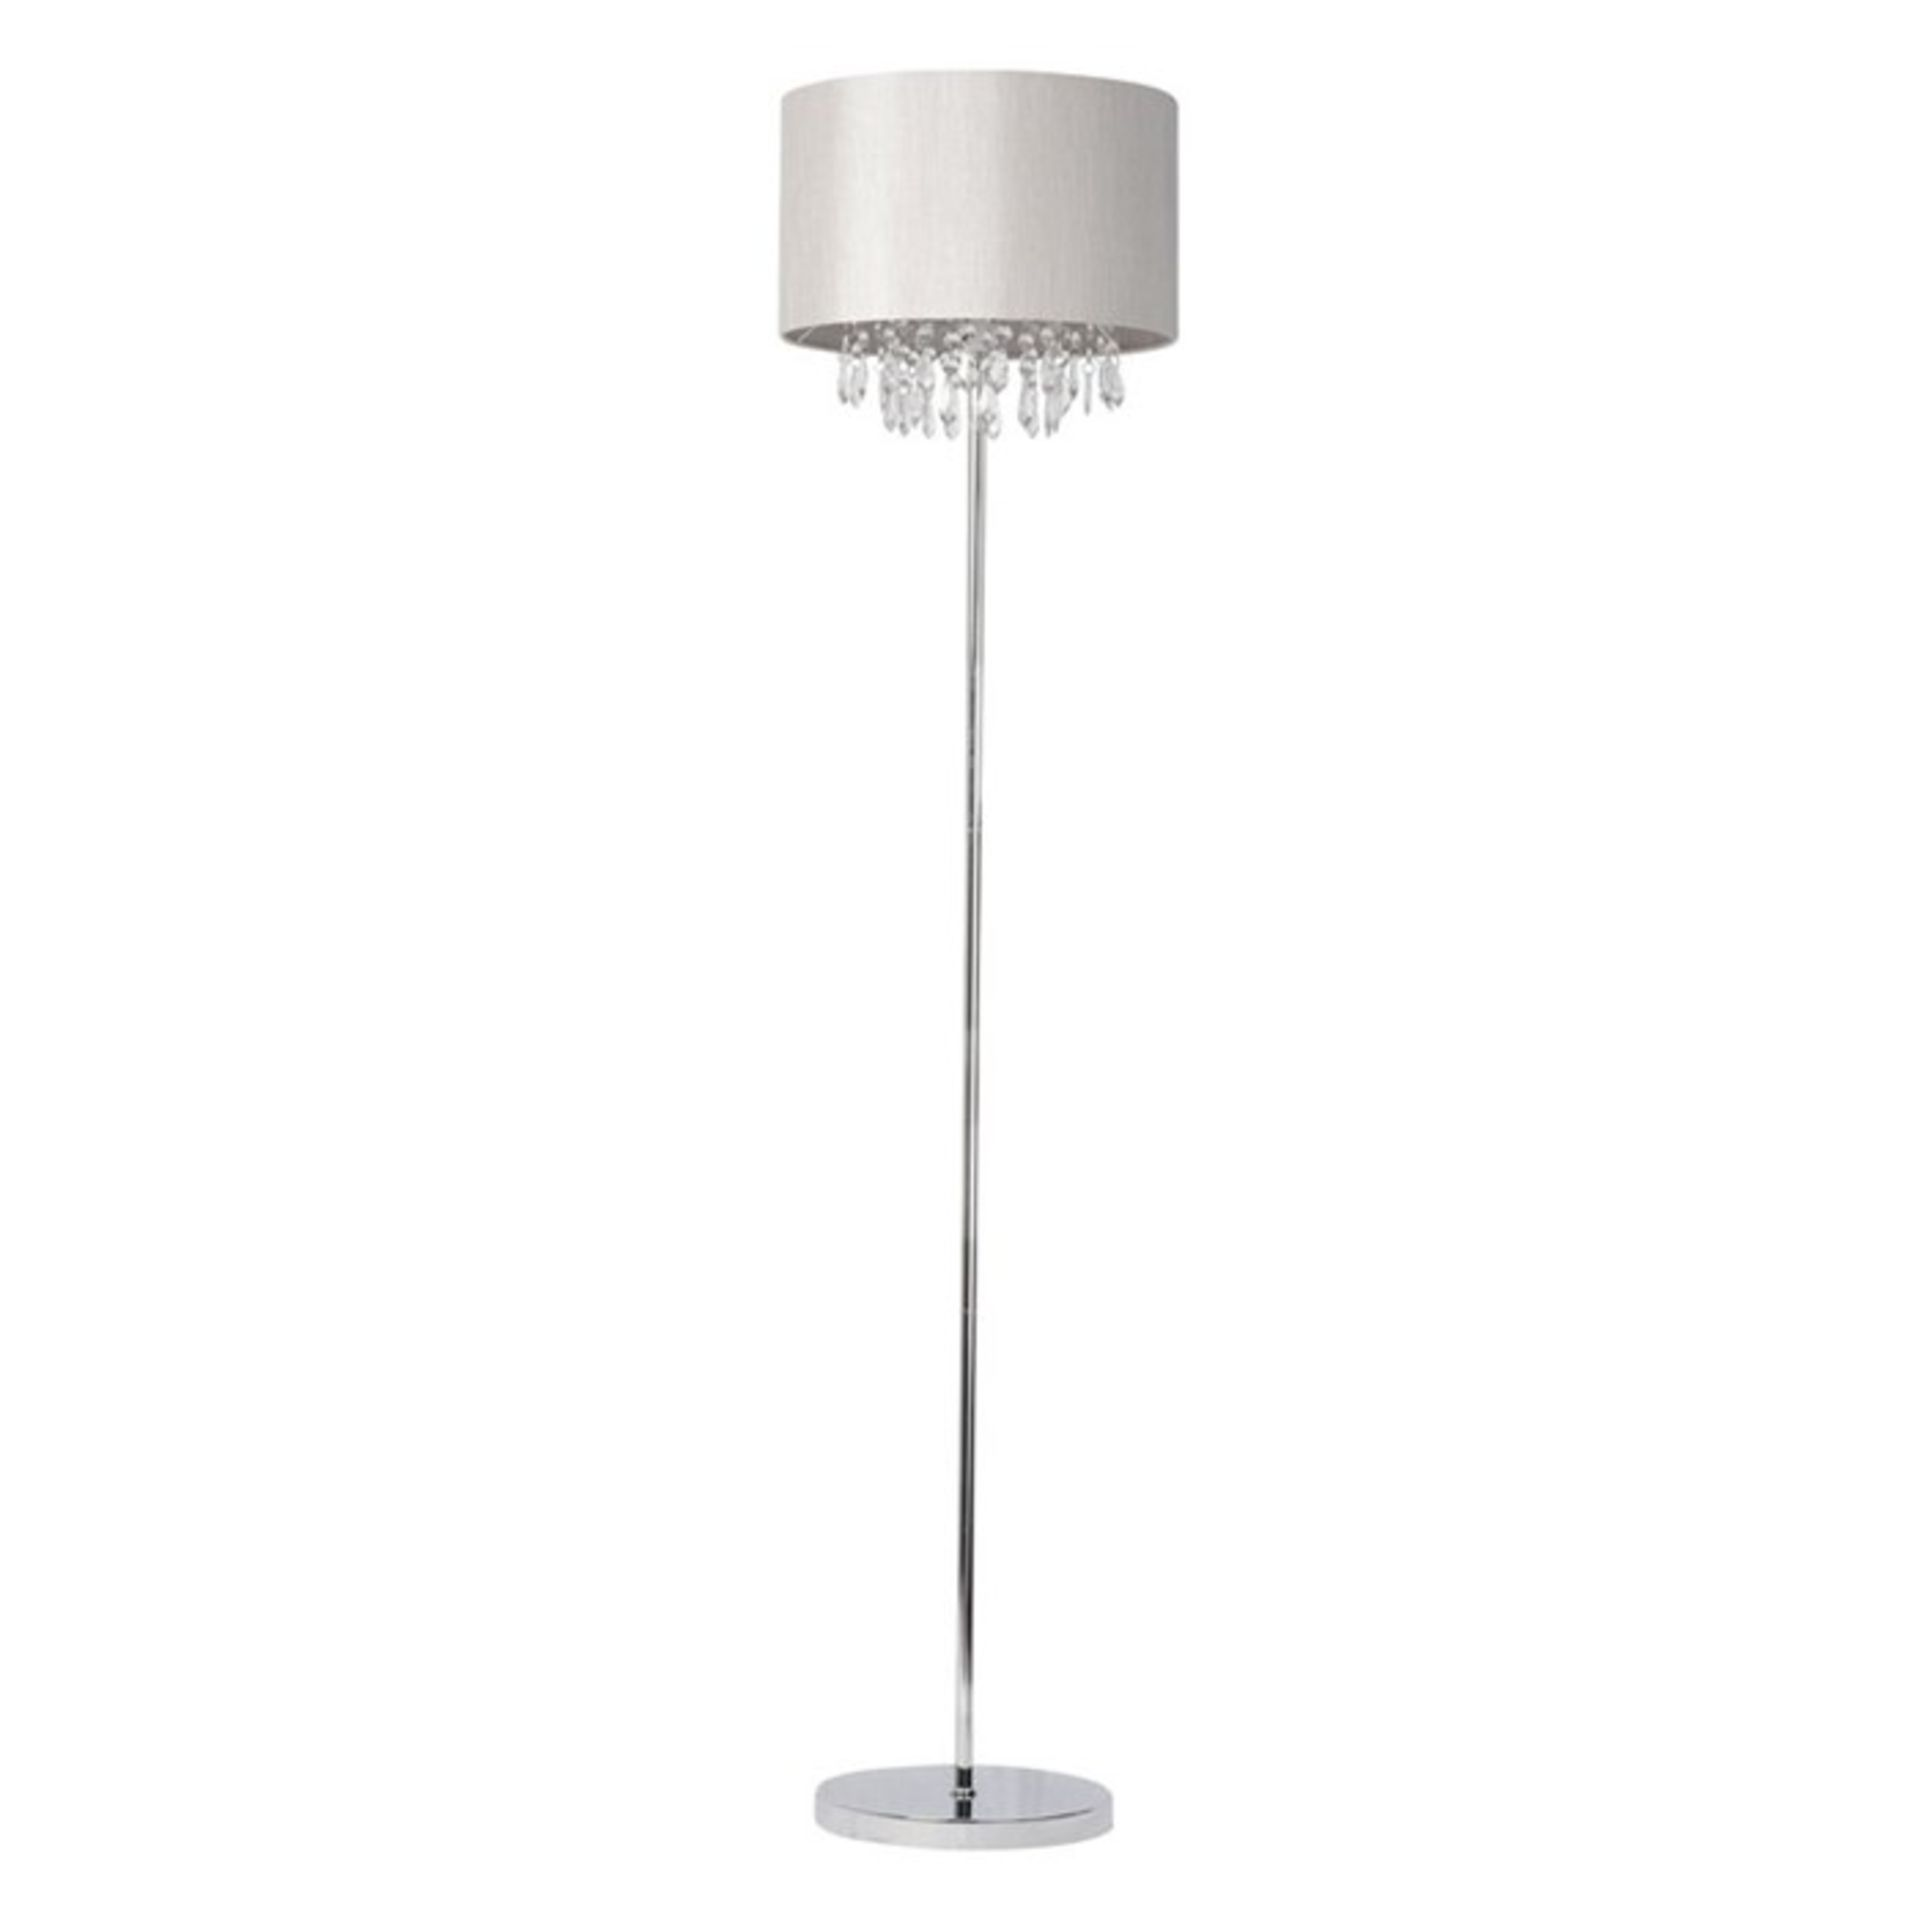 Rosdorf Park, Gracie 145cm Floor Lamp (CREAM/OFF WHITE SHADE) - RRP £66.99 (HOKF1483 - 21629/9) 4G